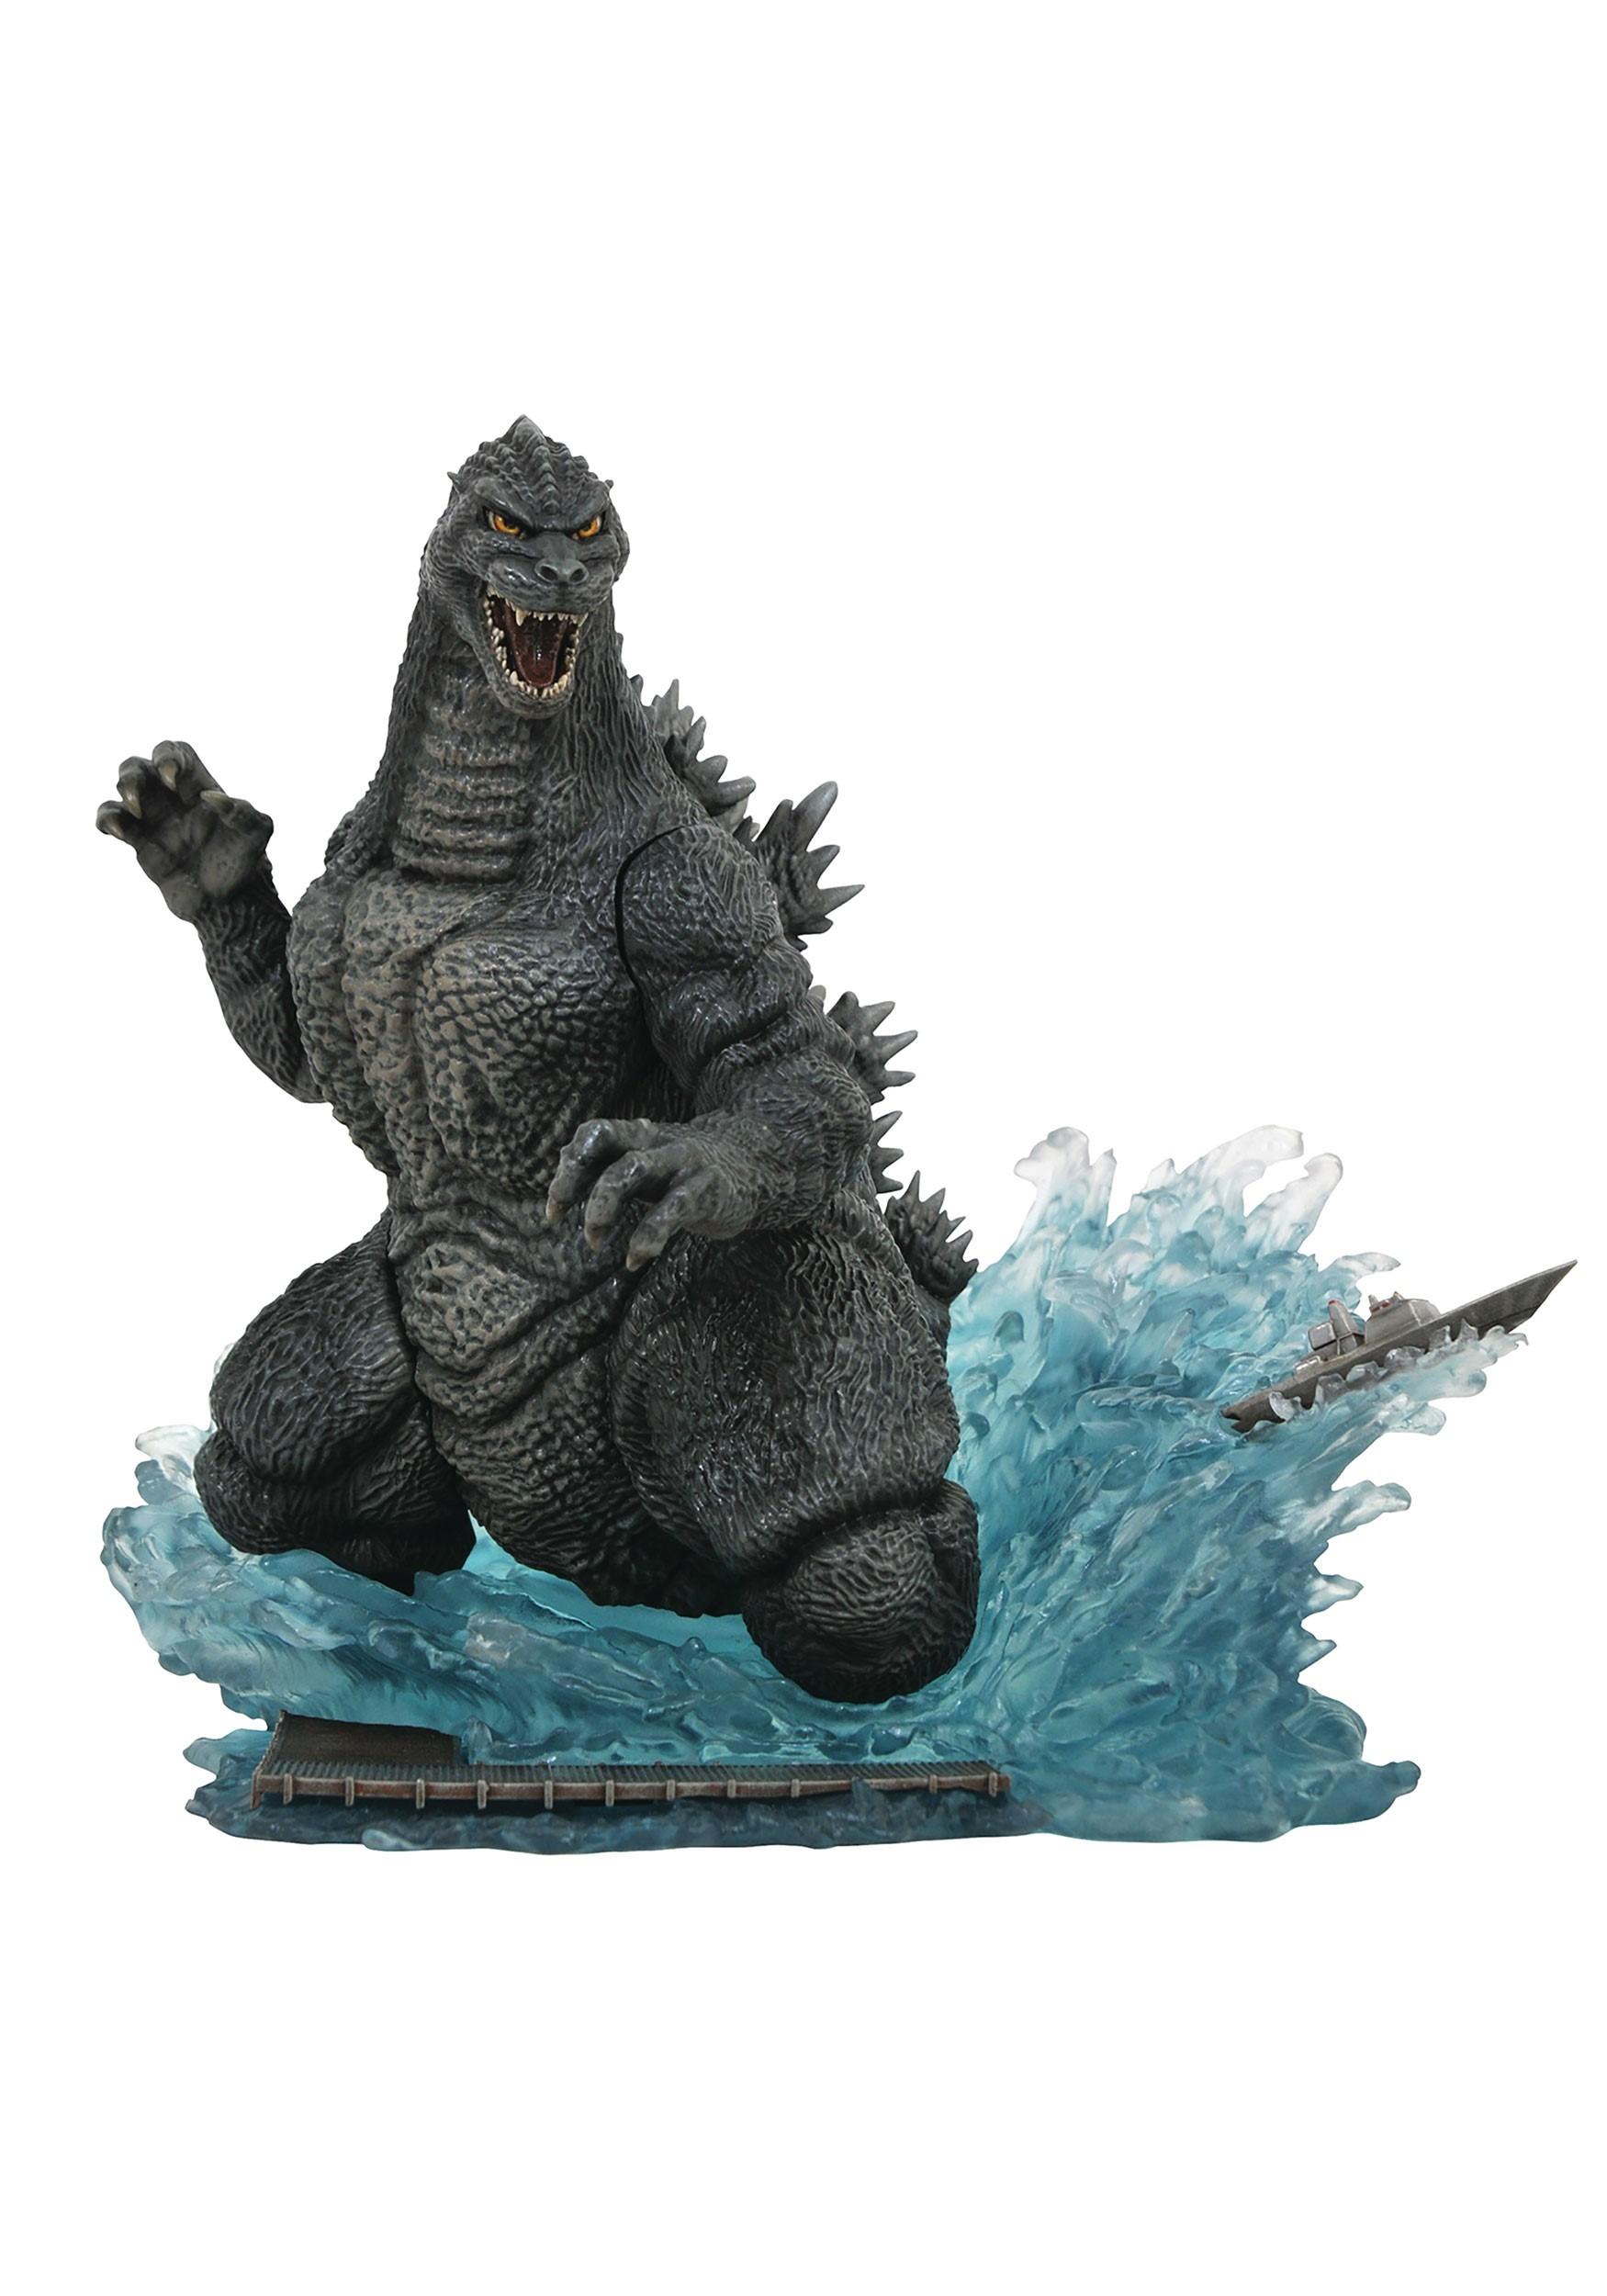 Godzilla_Gallery_1991_DLX_Godzilla_PVC_Figure